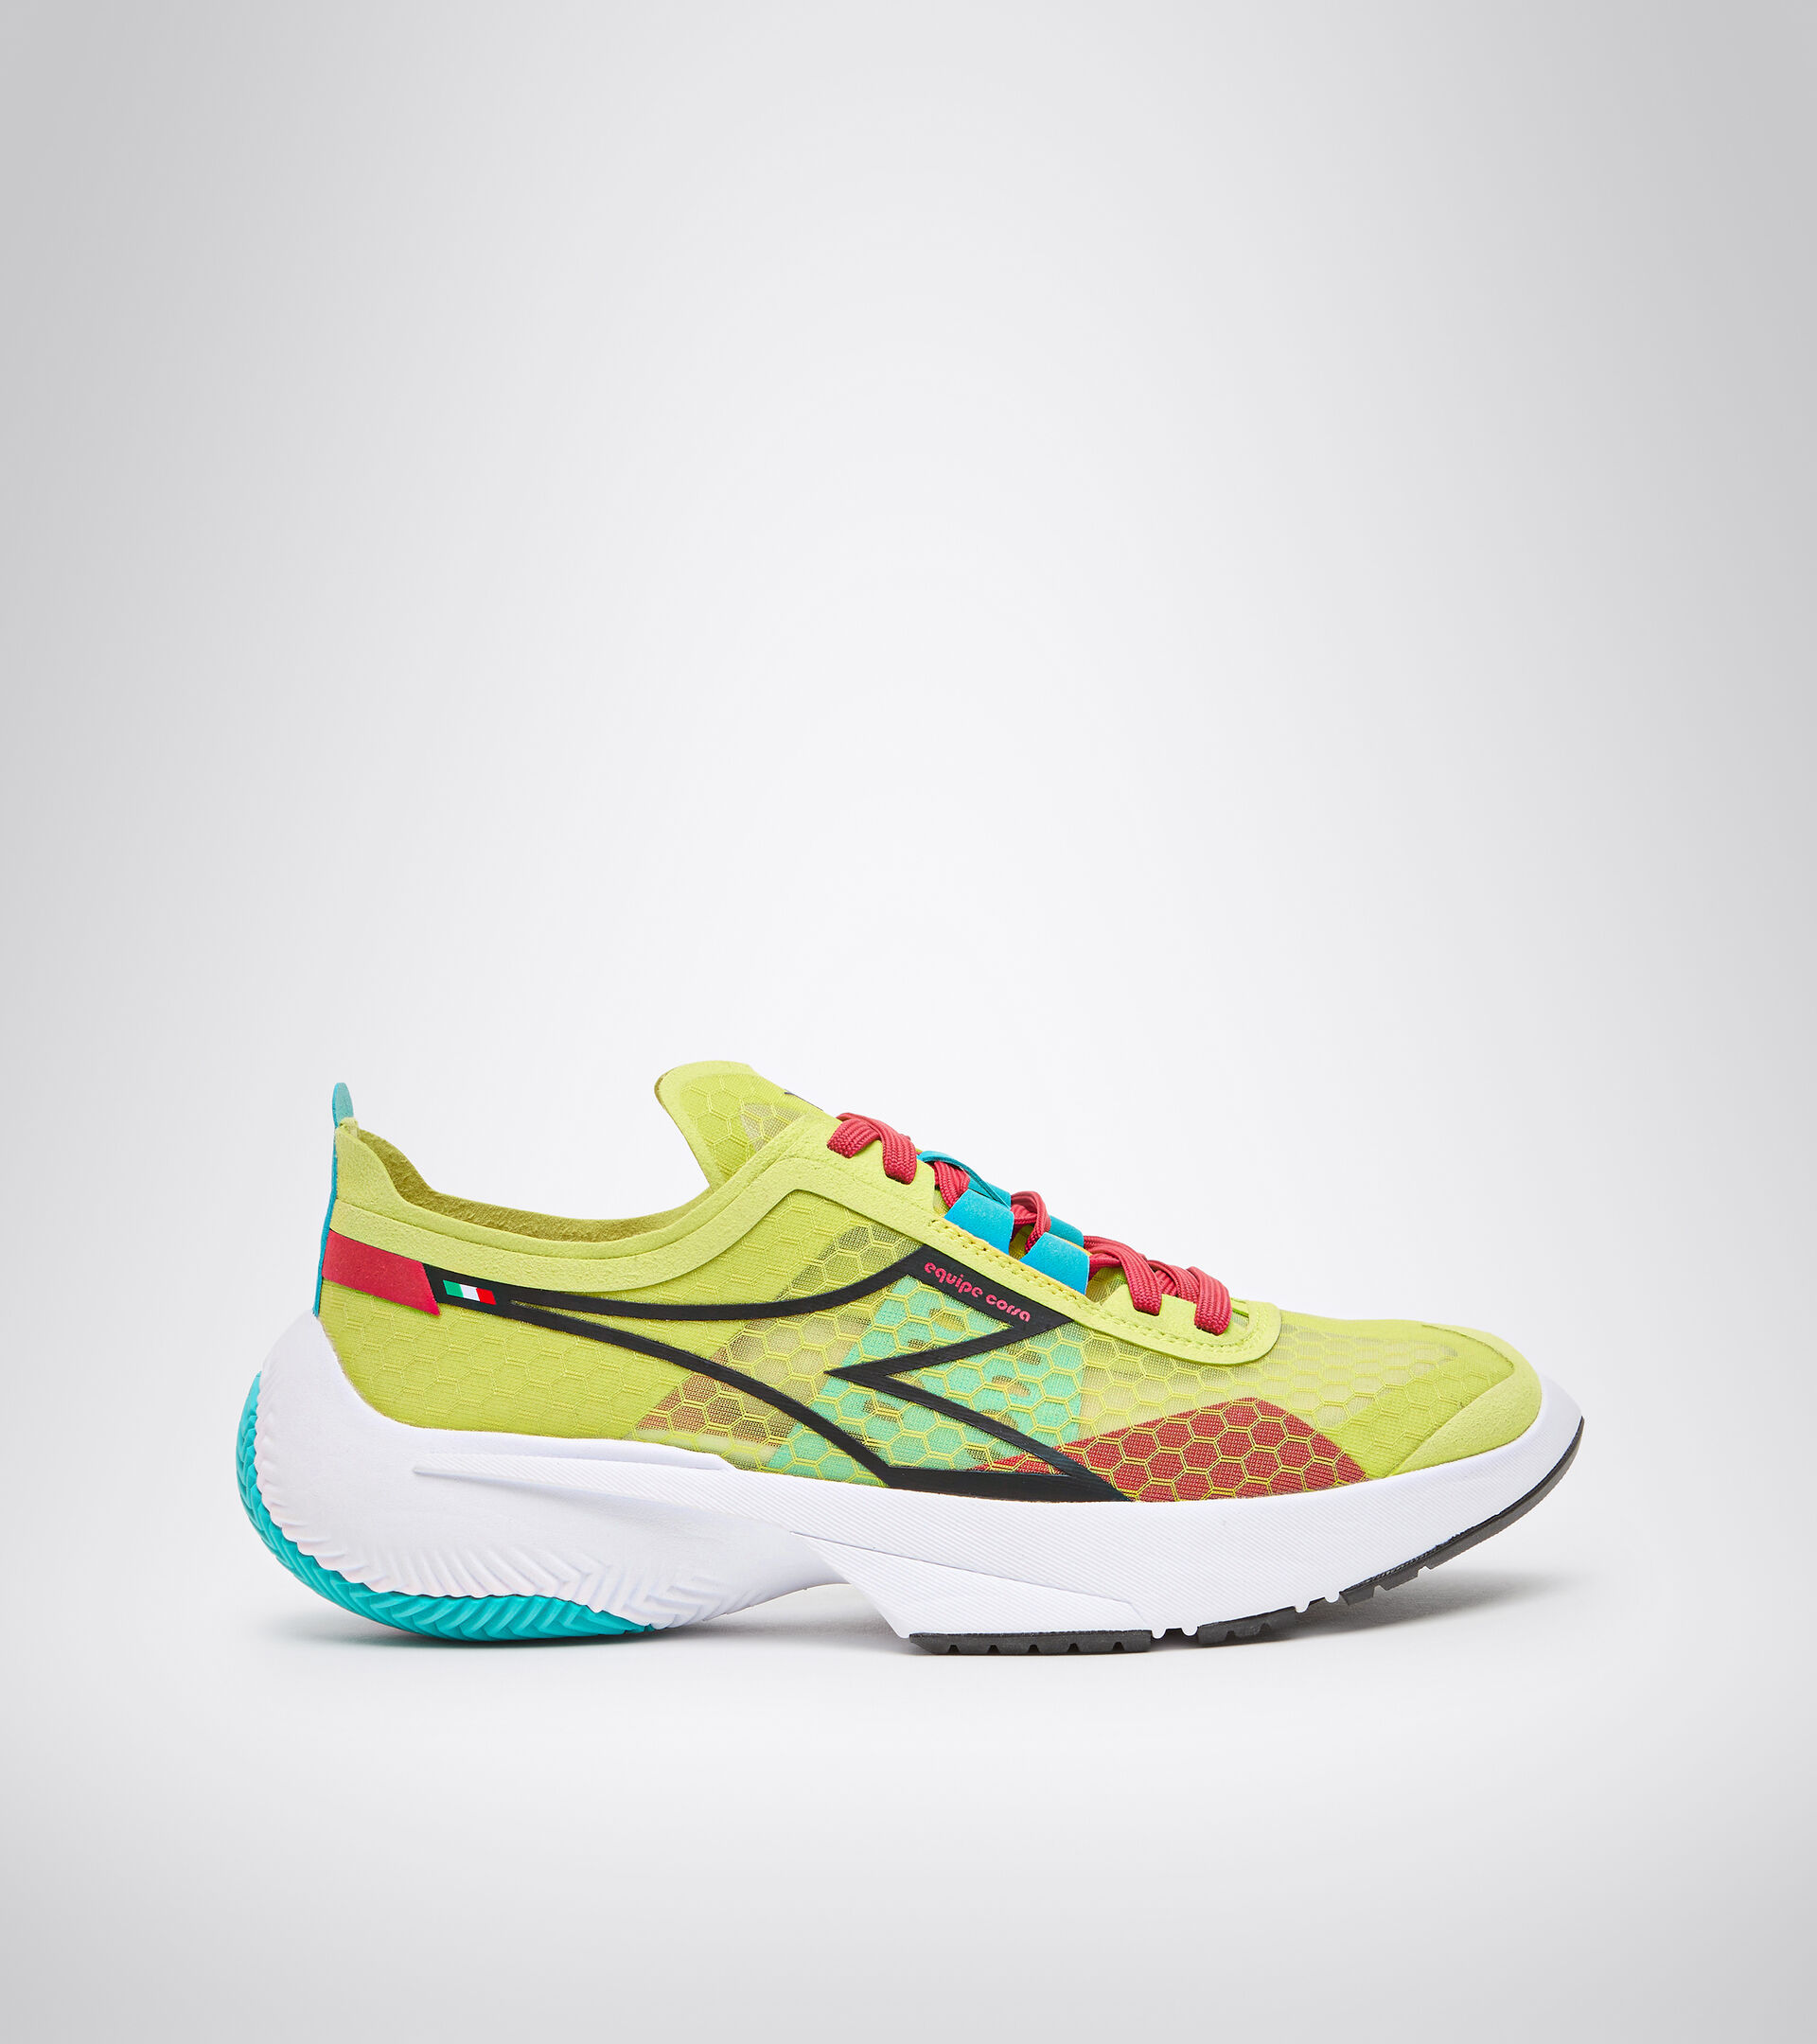 Footwear Sport UNISEX EQUIPE CORSA VERDE SORGENTE/NERO/BIANCO Diadora